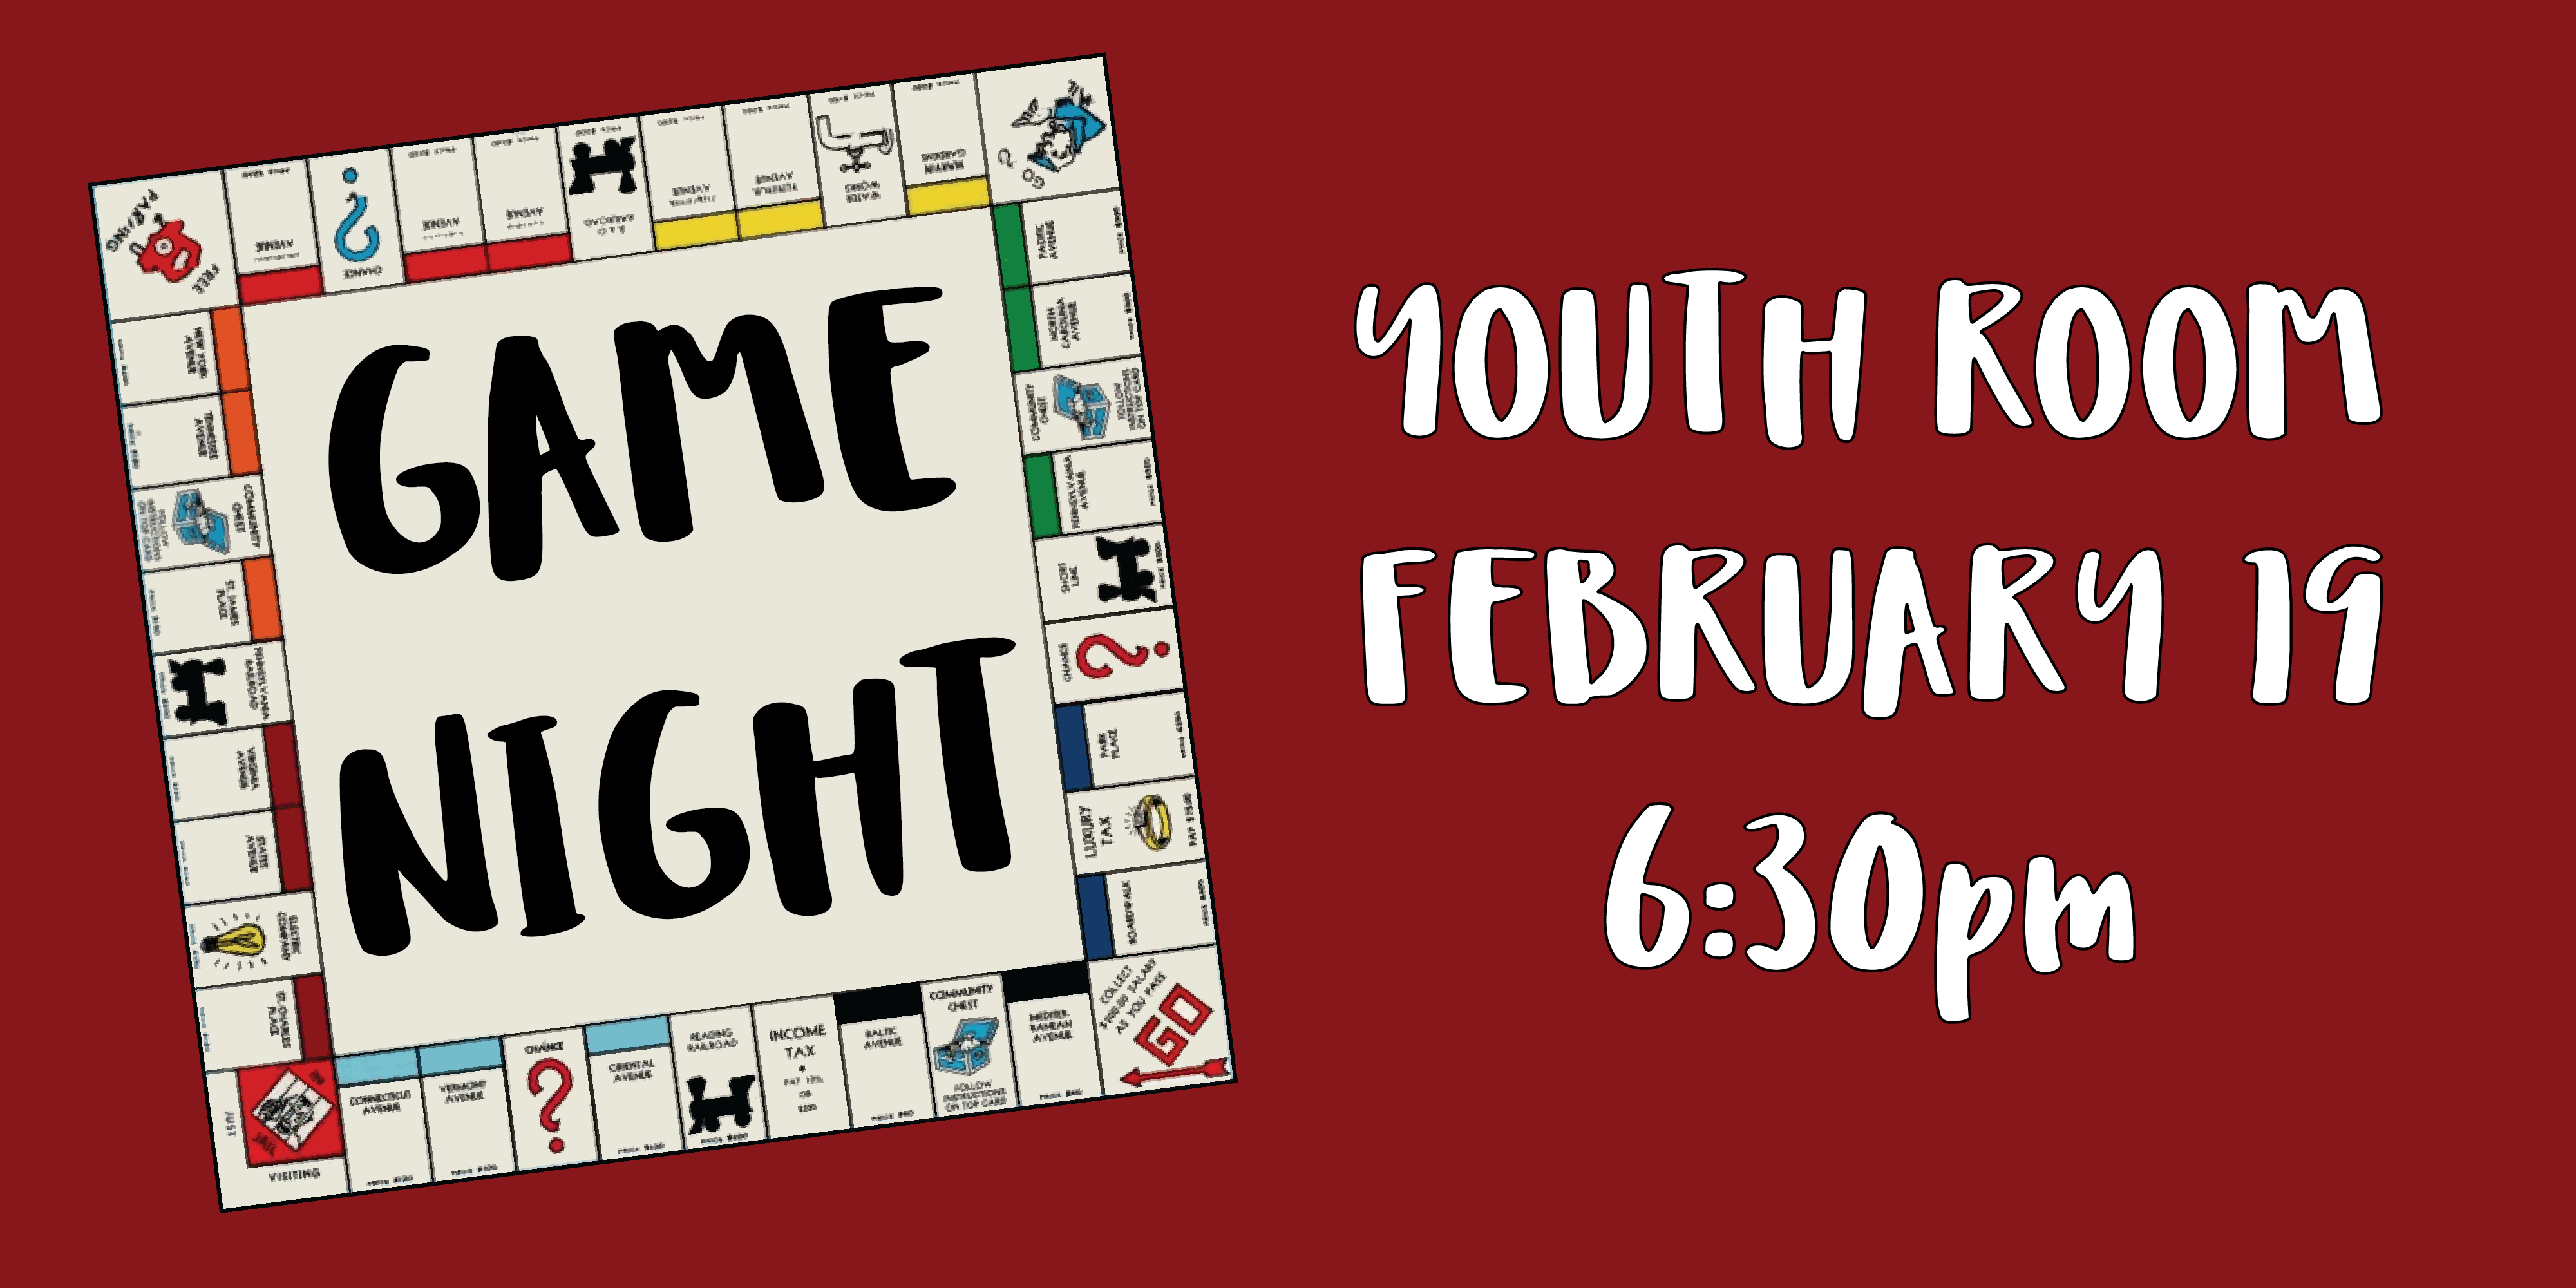 Highlands Presbyterian Church Youth Game Night